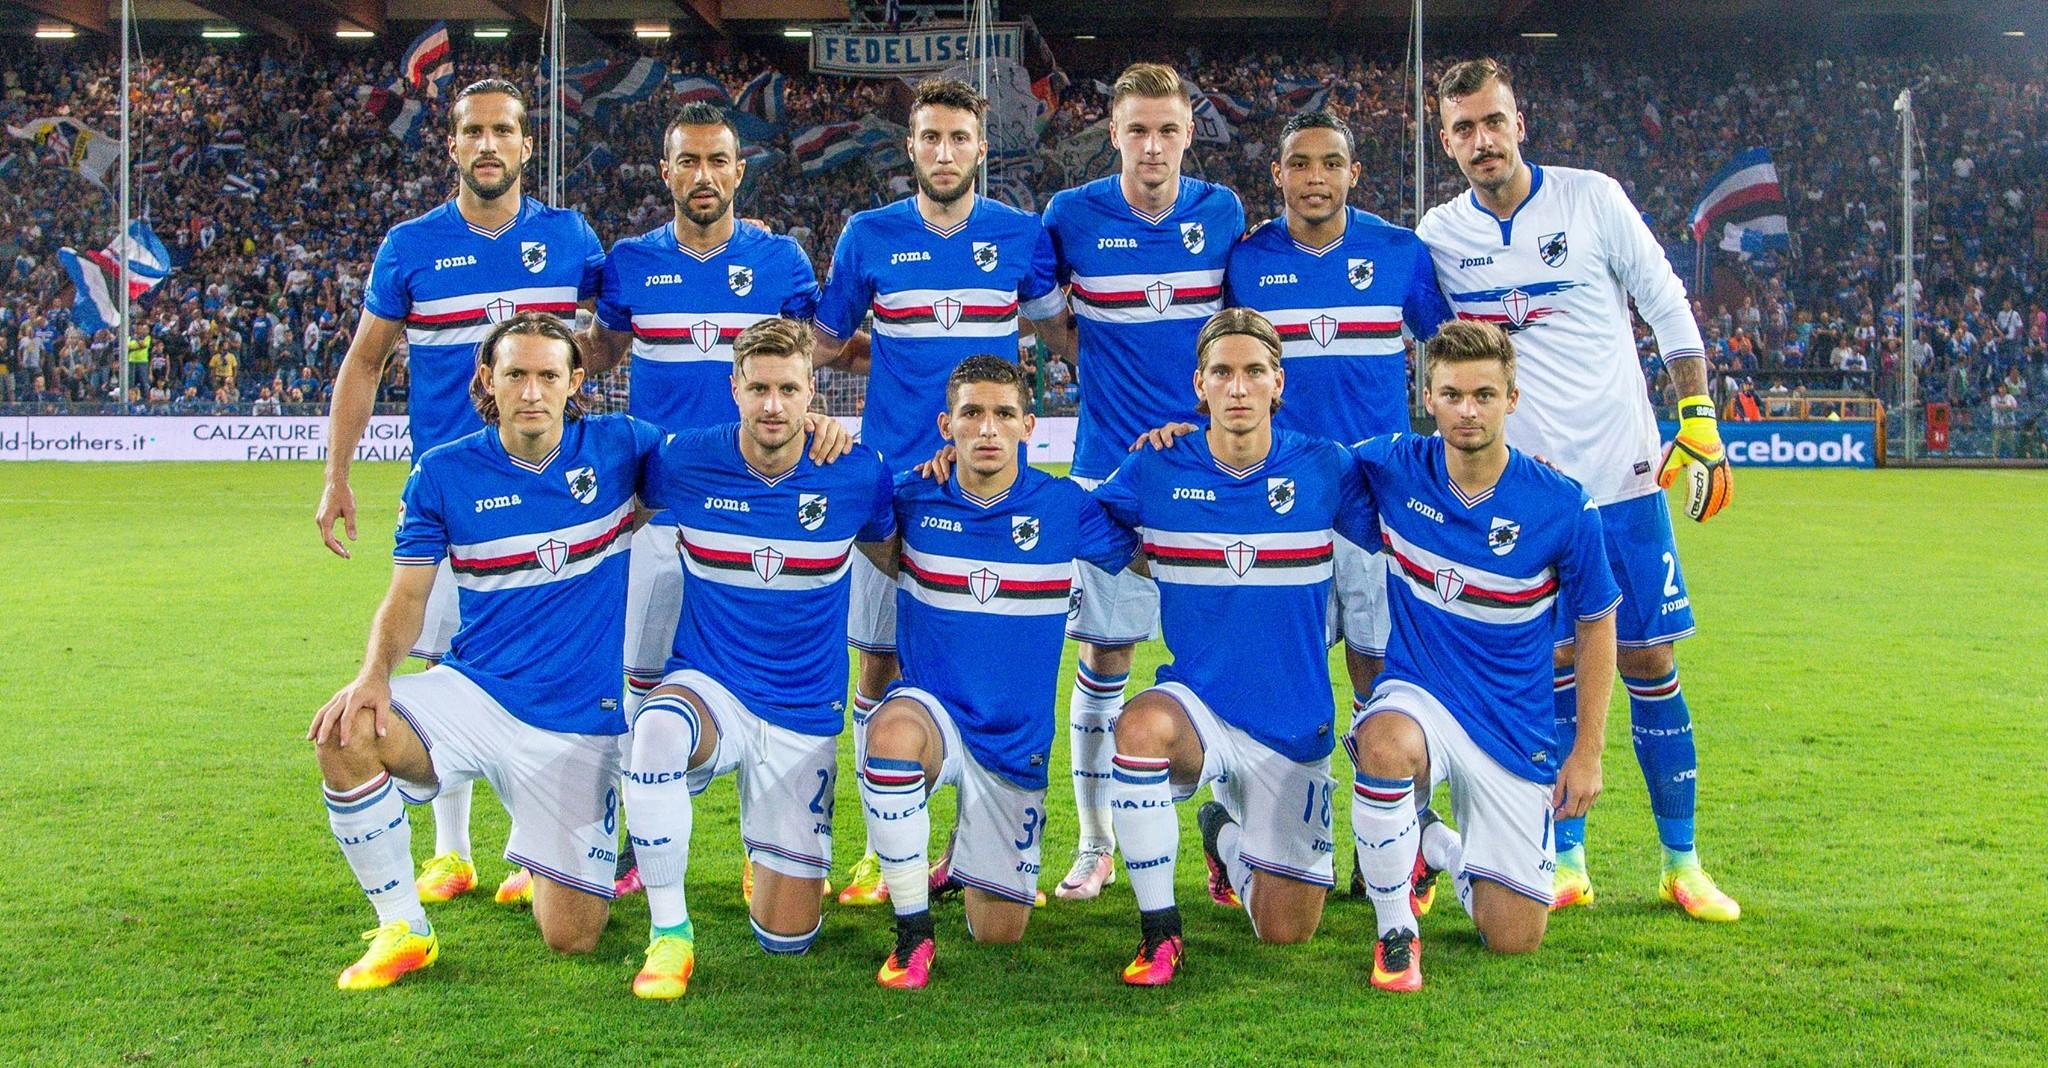 sampdoria-formazione-ufficiale